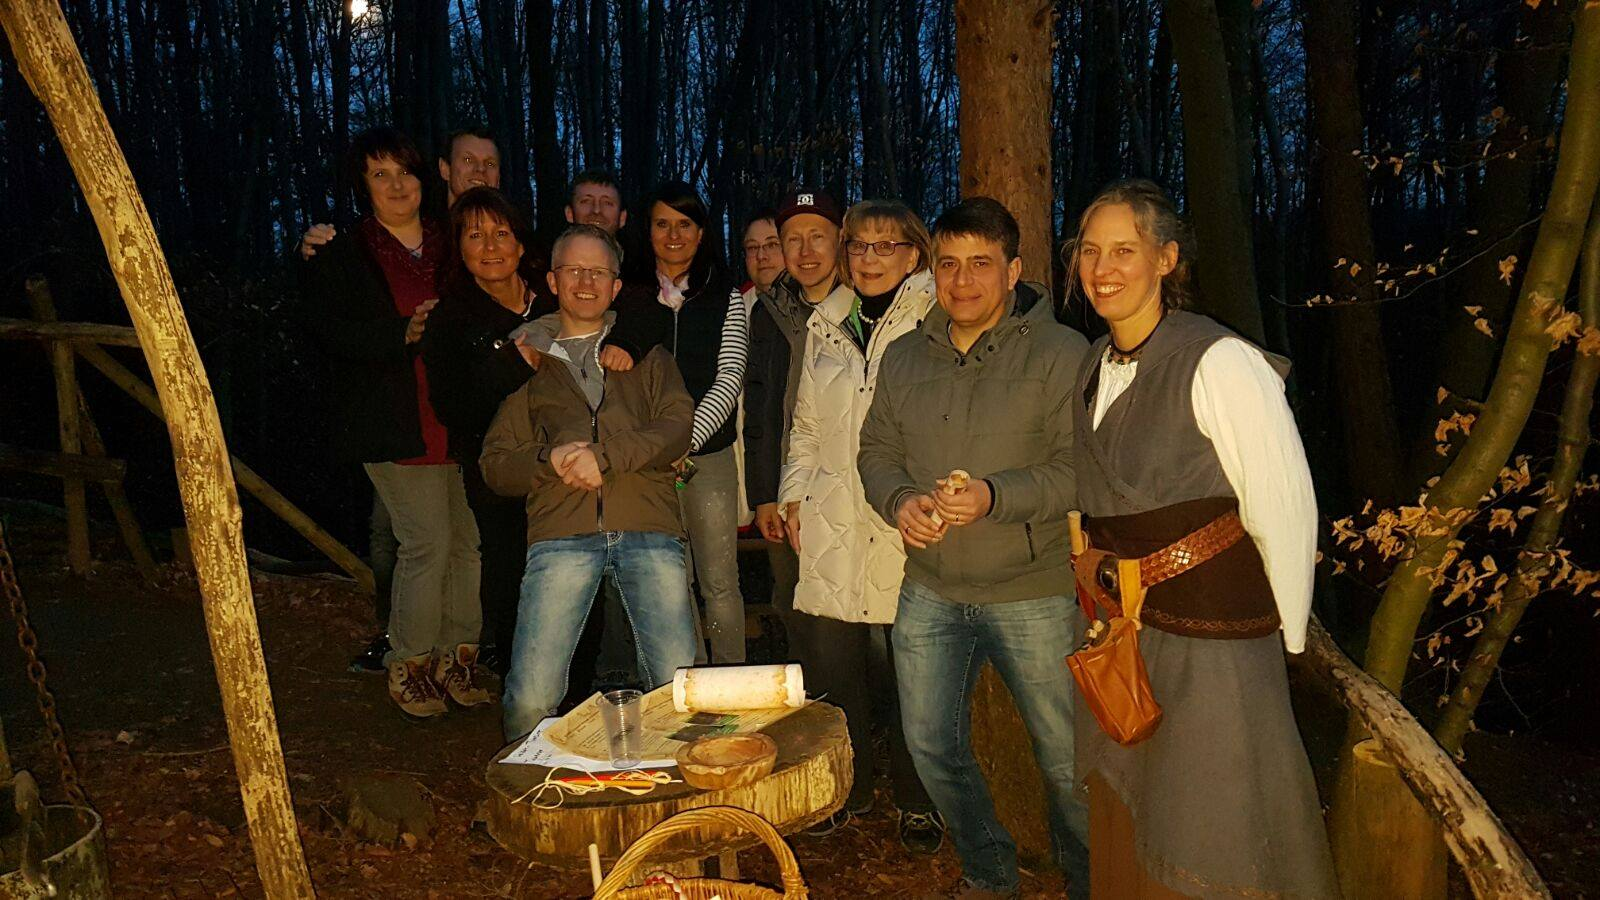 Projekt Kick-off Heidelberg Walldorf  Sinsheim